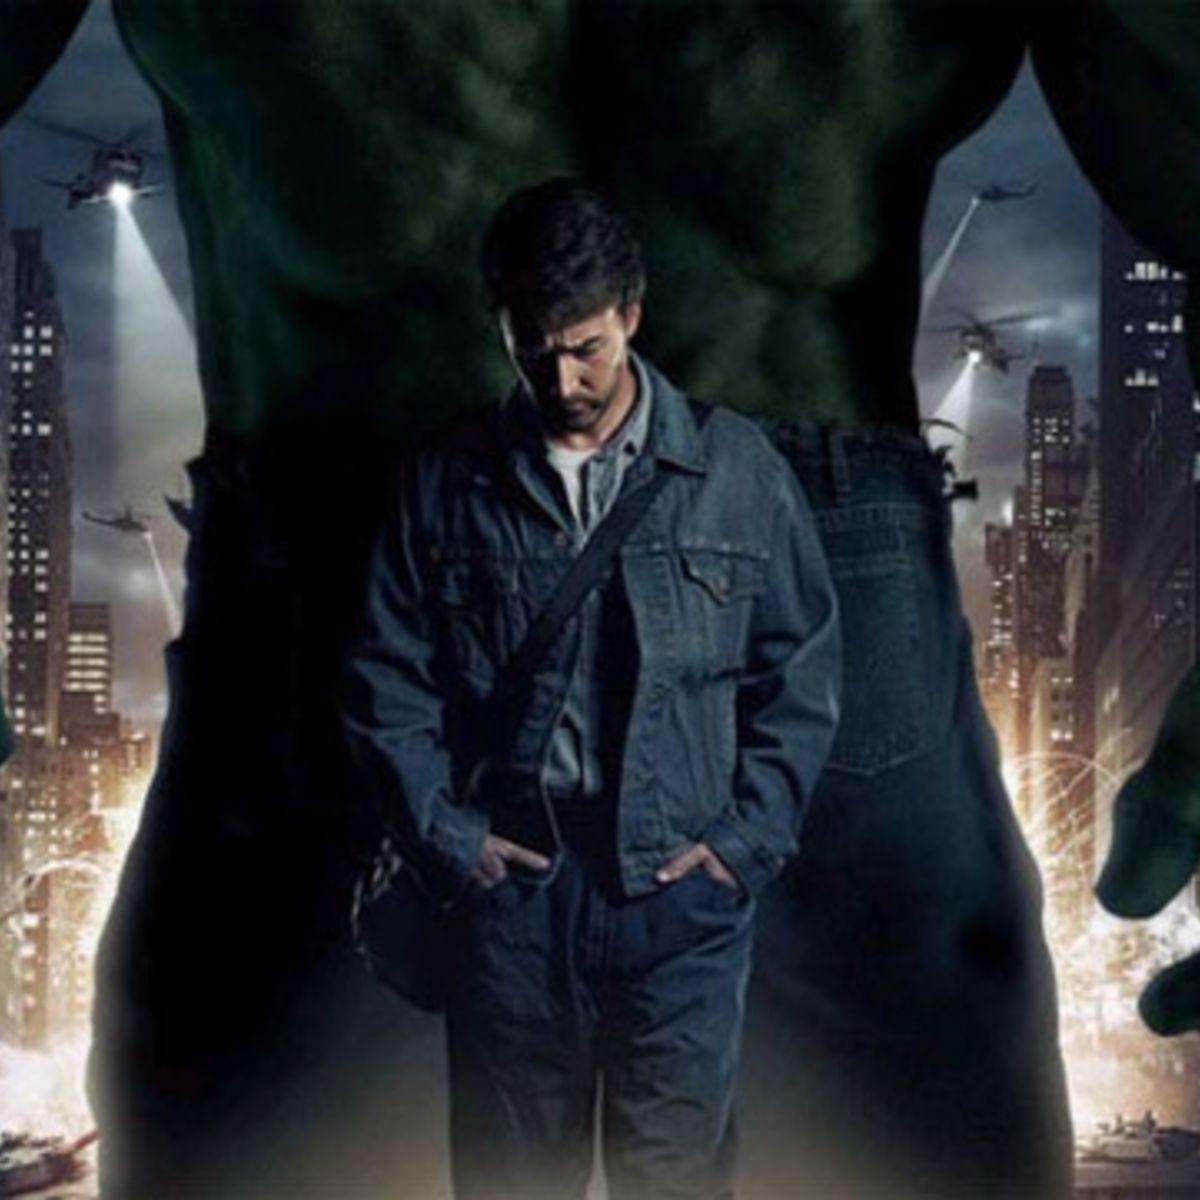 edward_norton_hulk_avengers_0.jpg